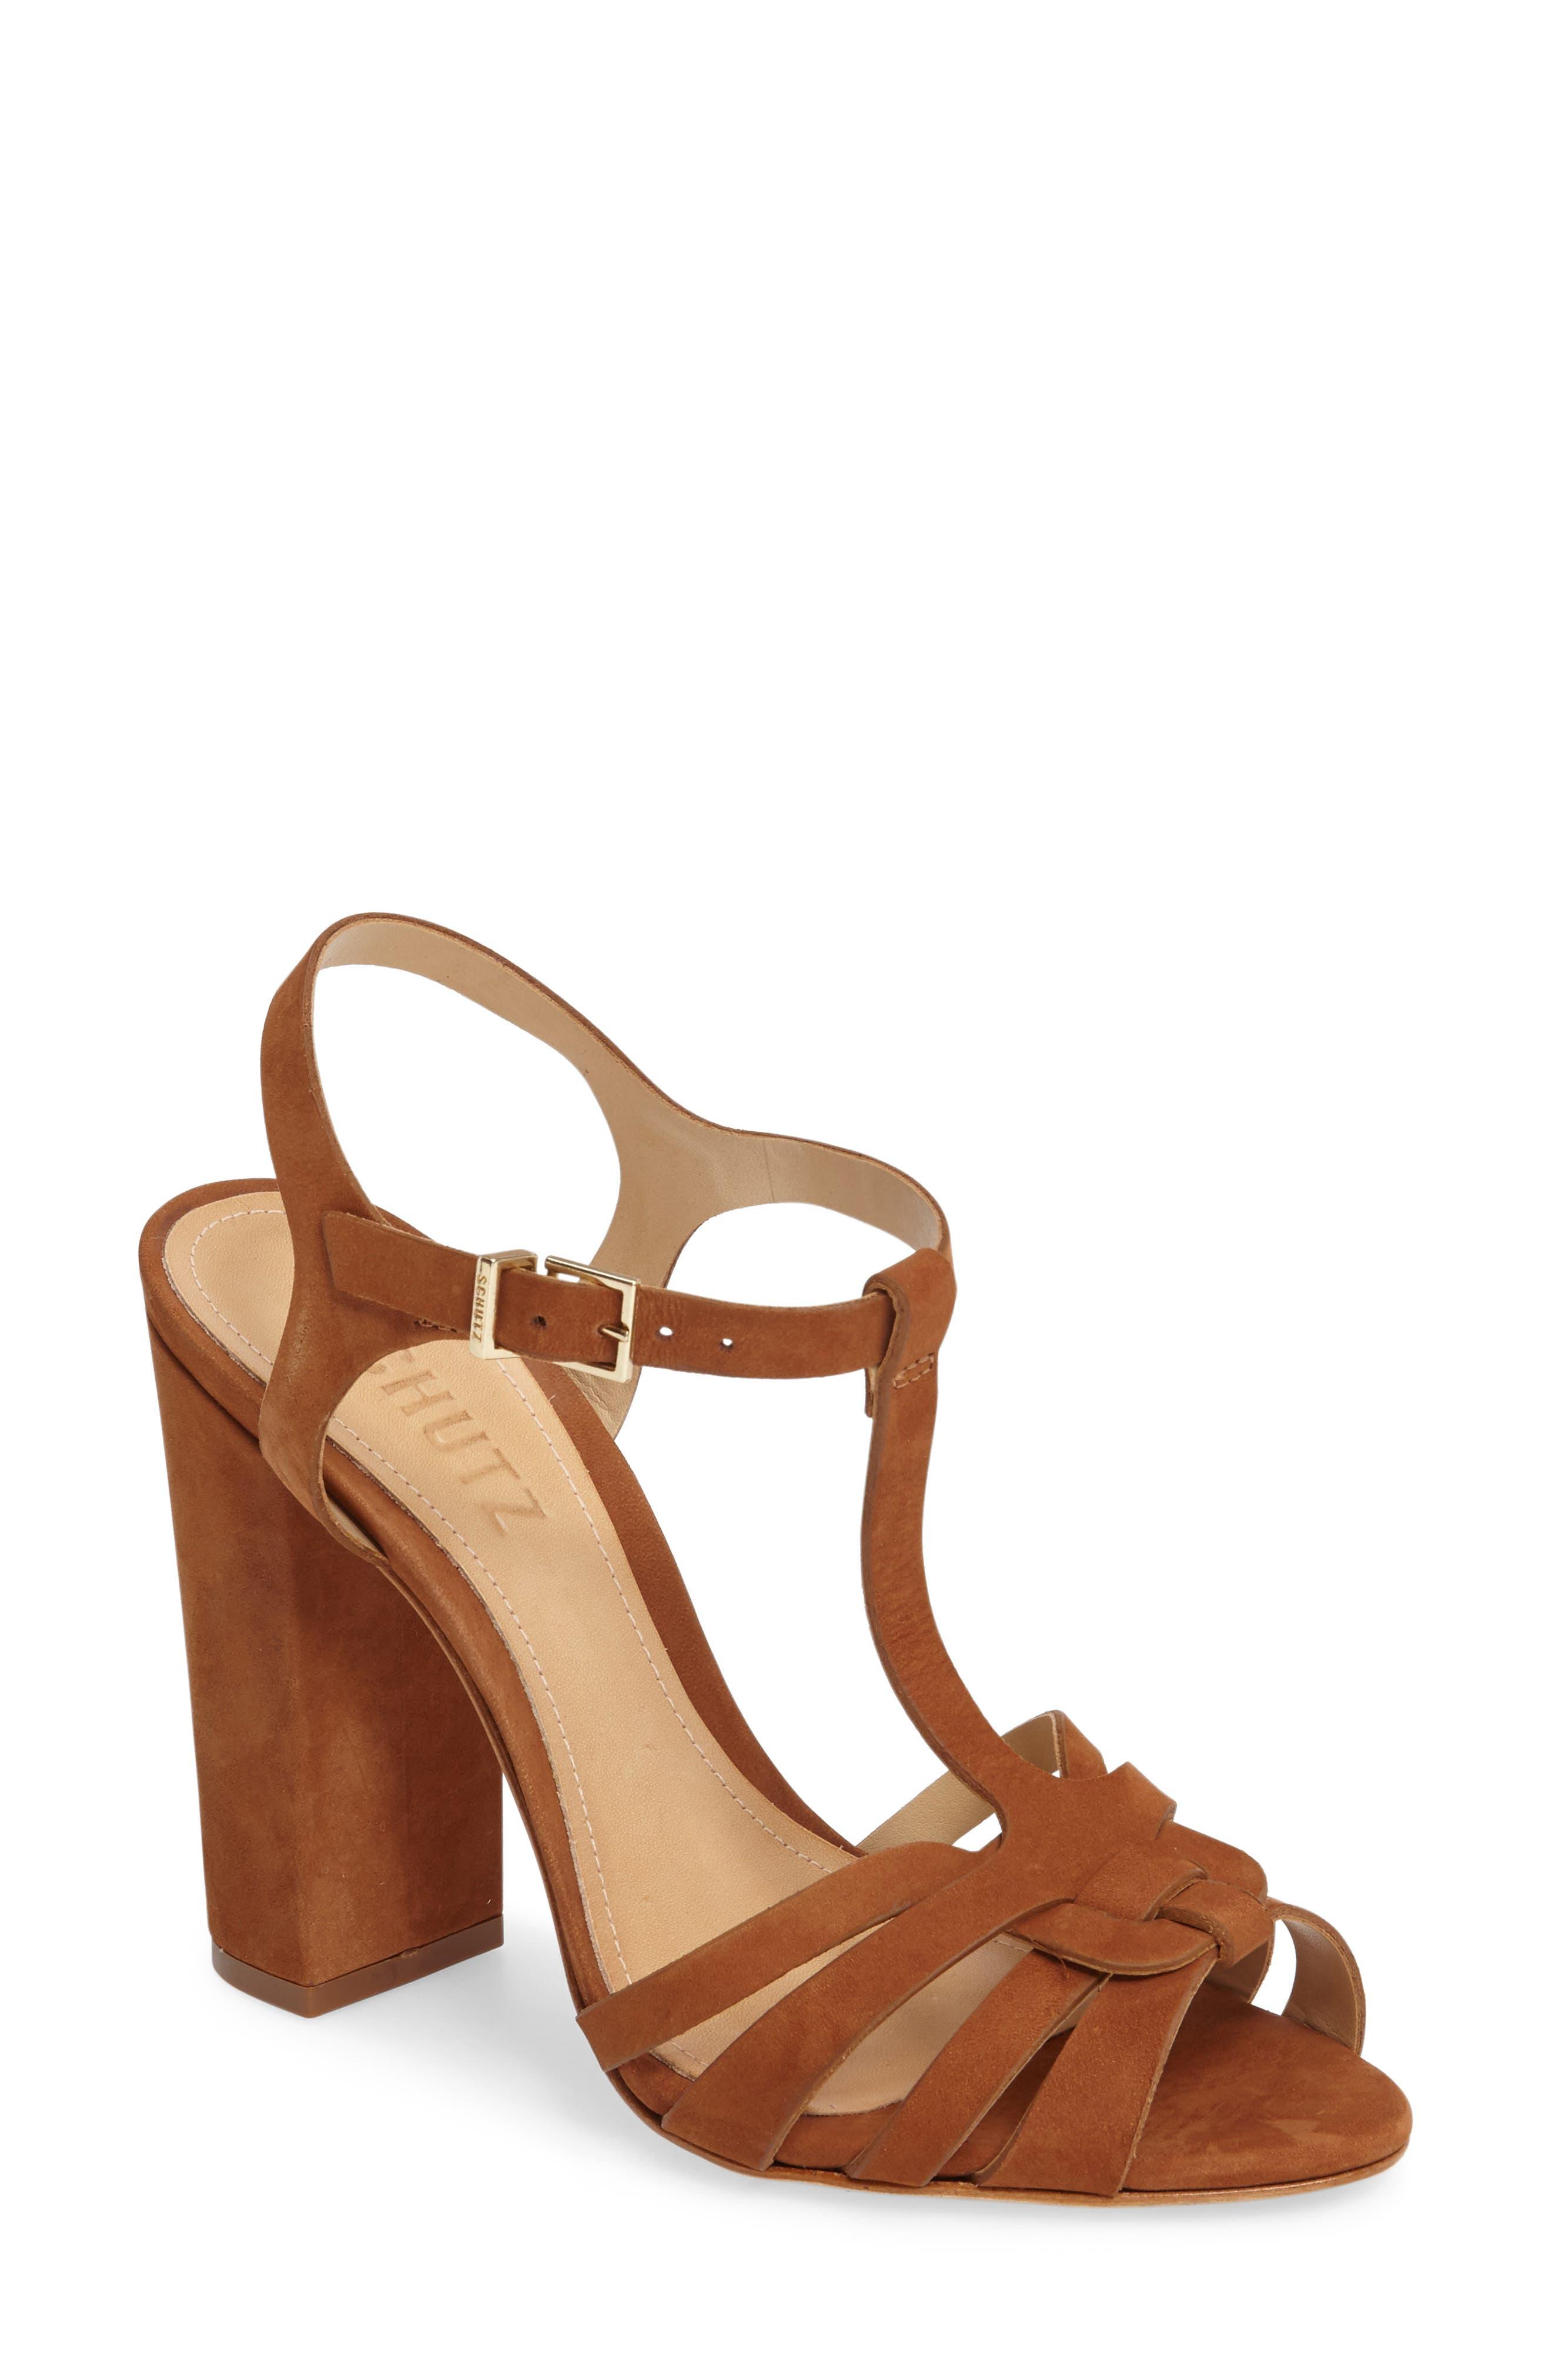 Sorella Sandal,                             Main thumbnail 1, color,                             Saddle